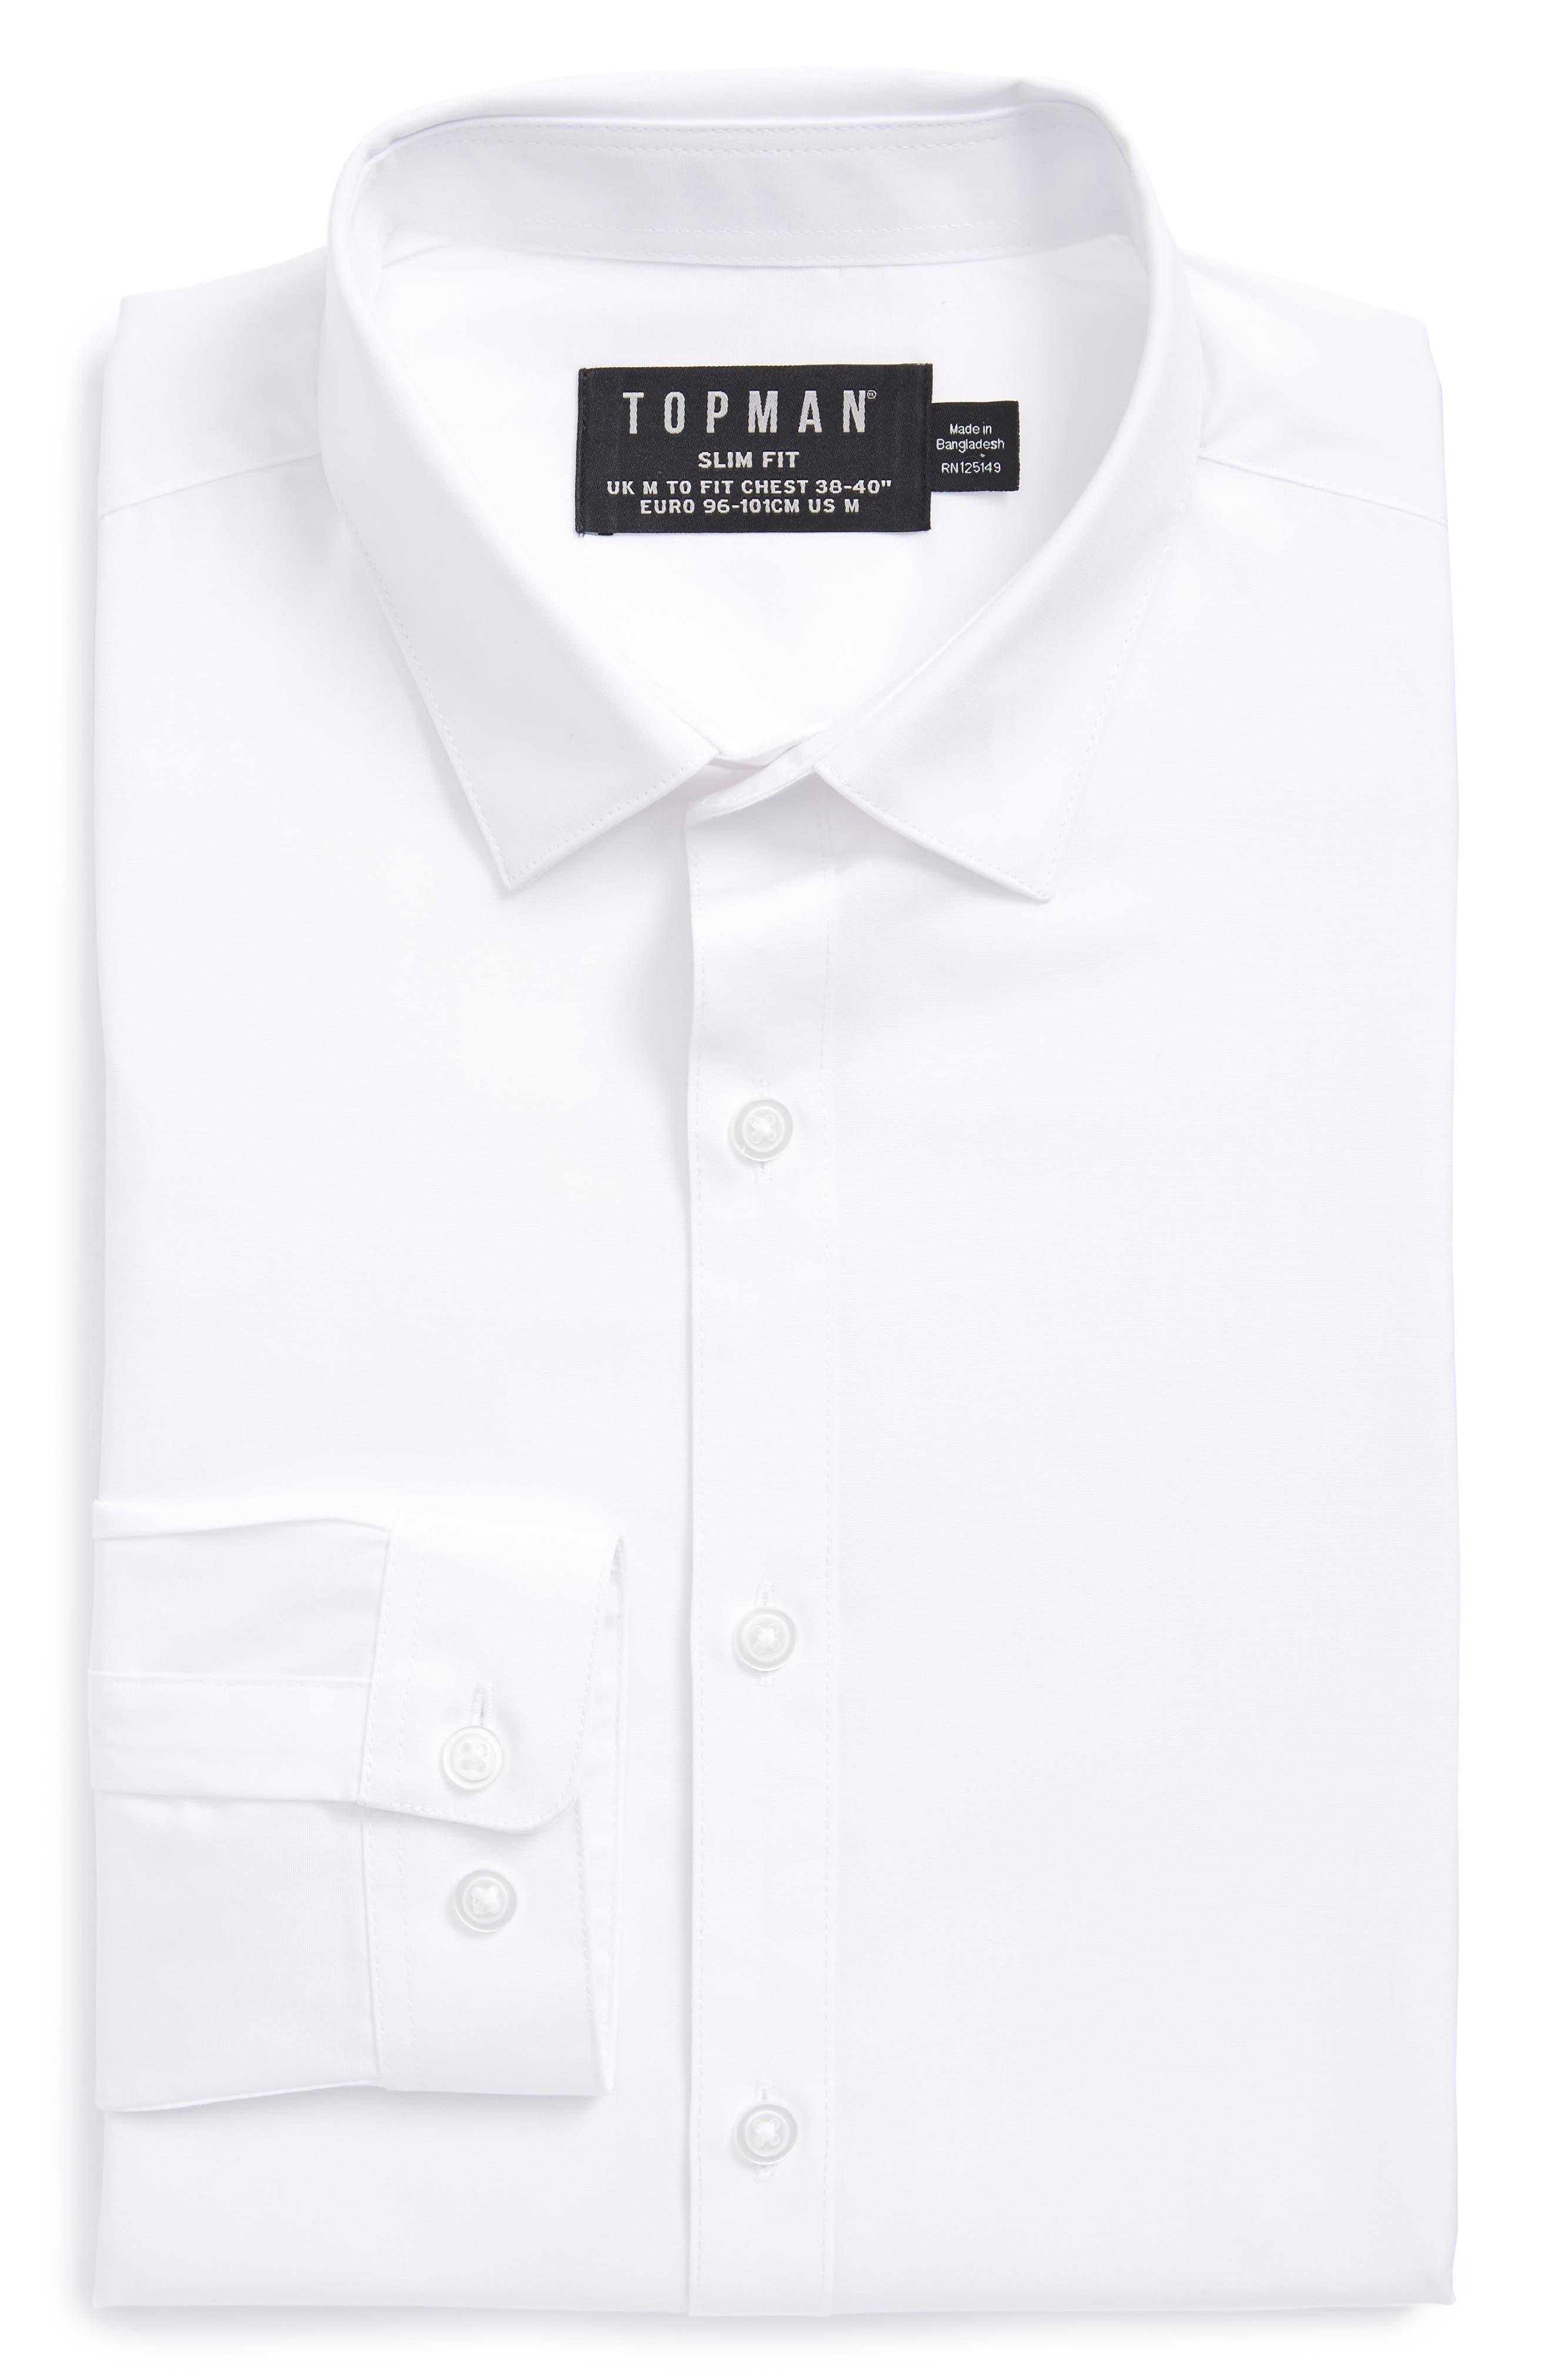 Topman Shirts | Nordstrom